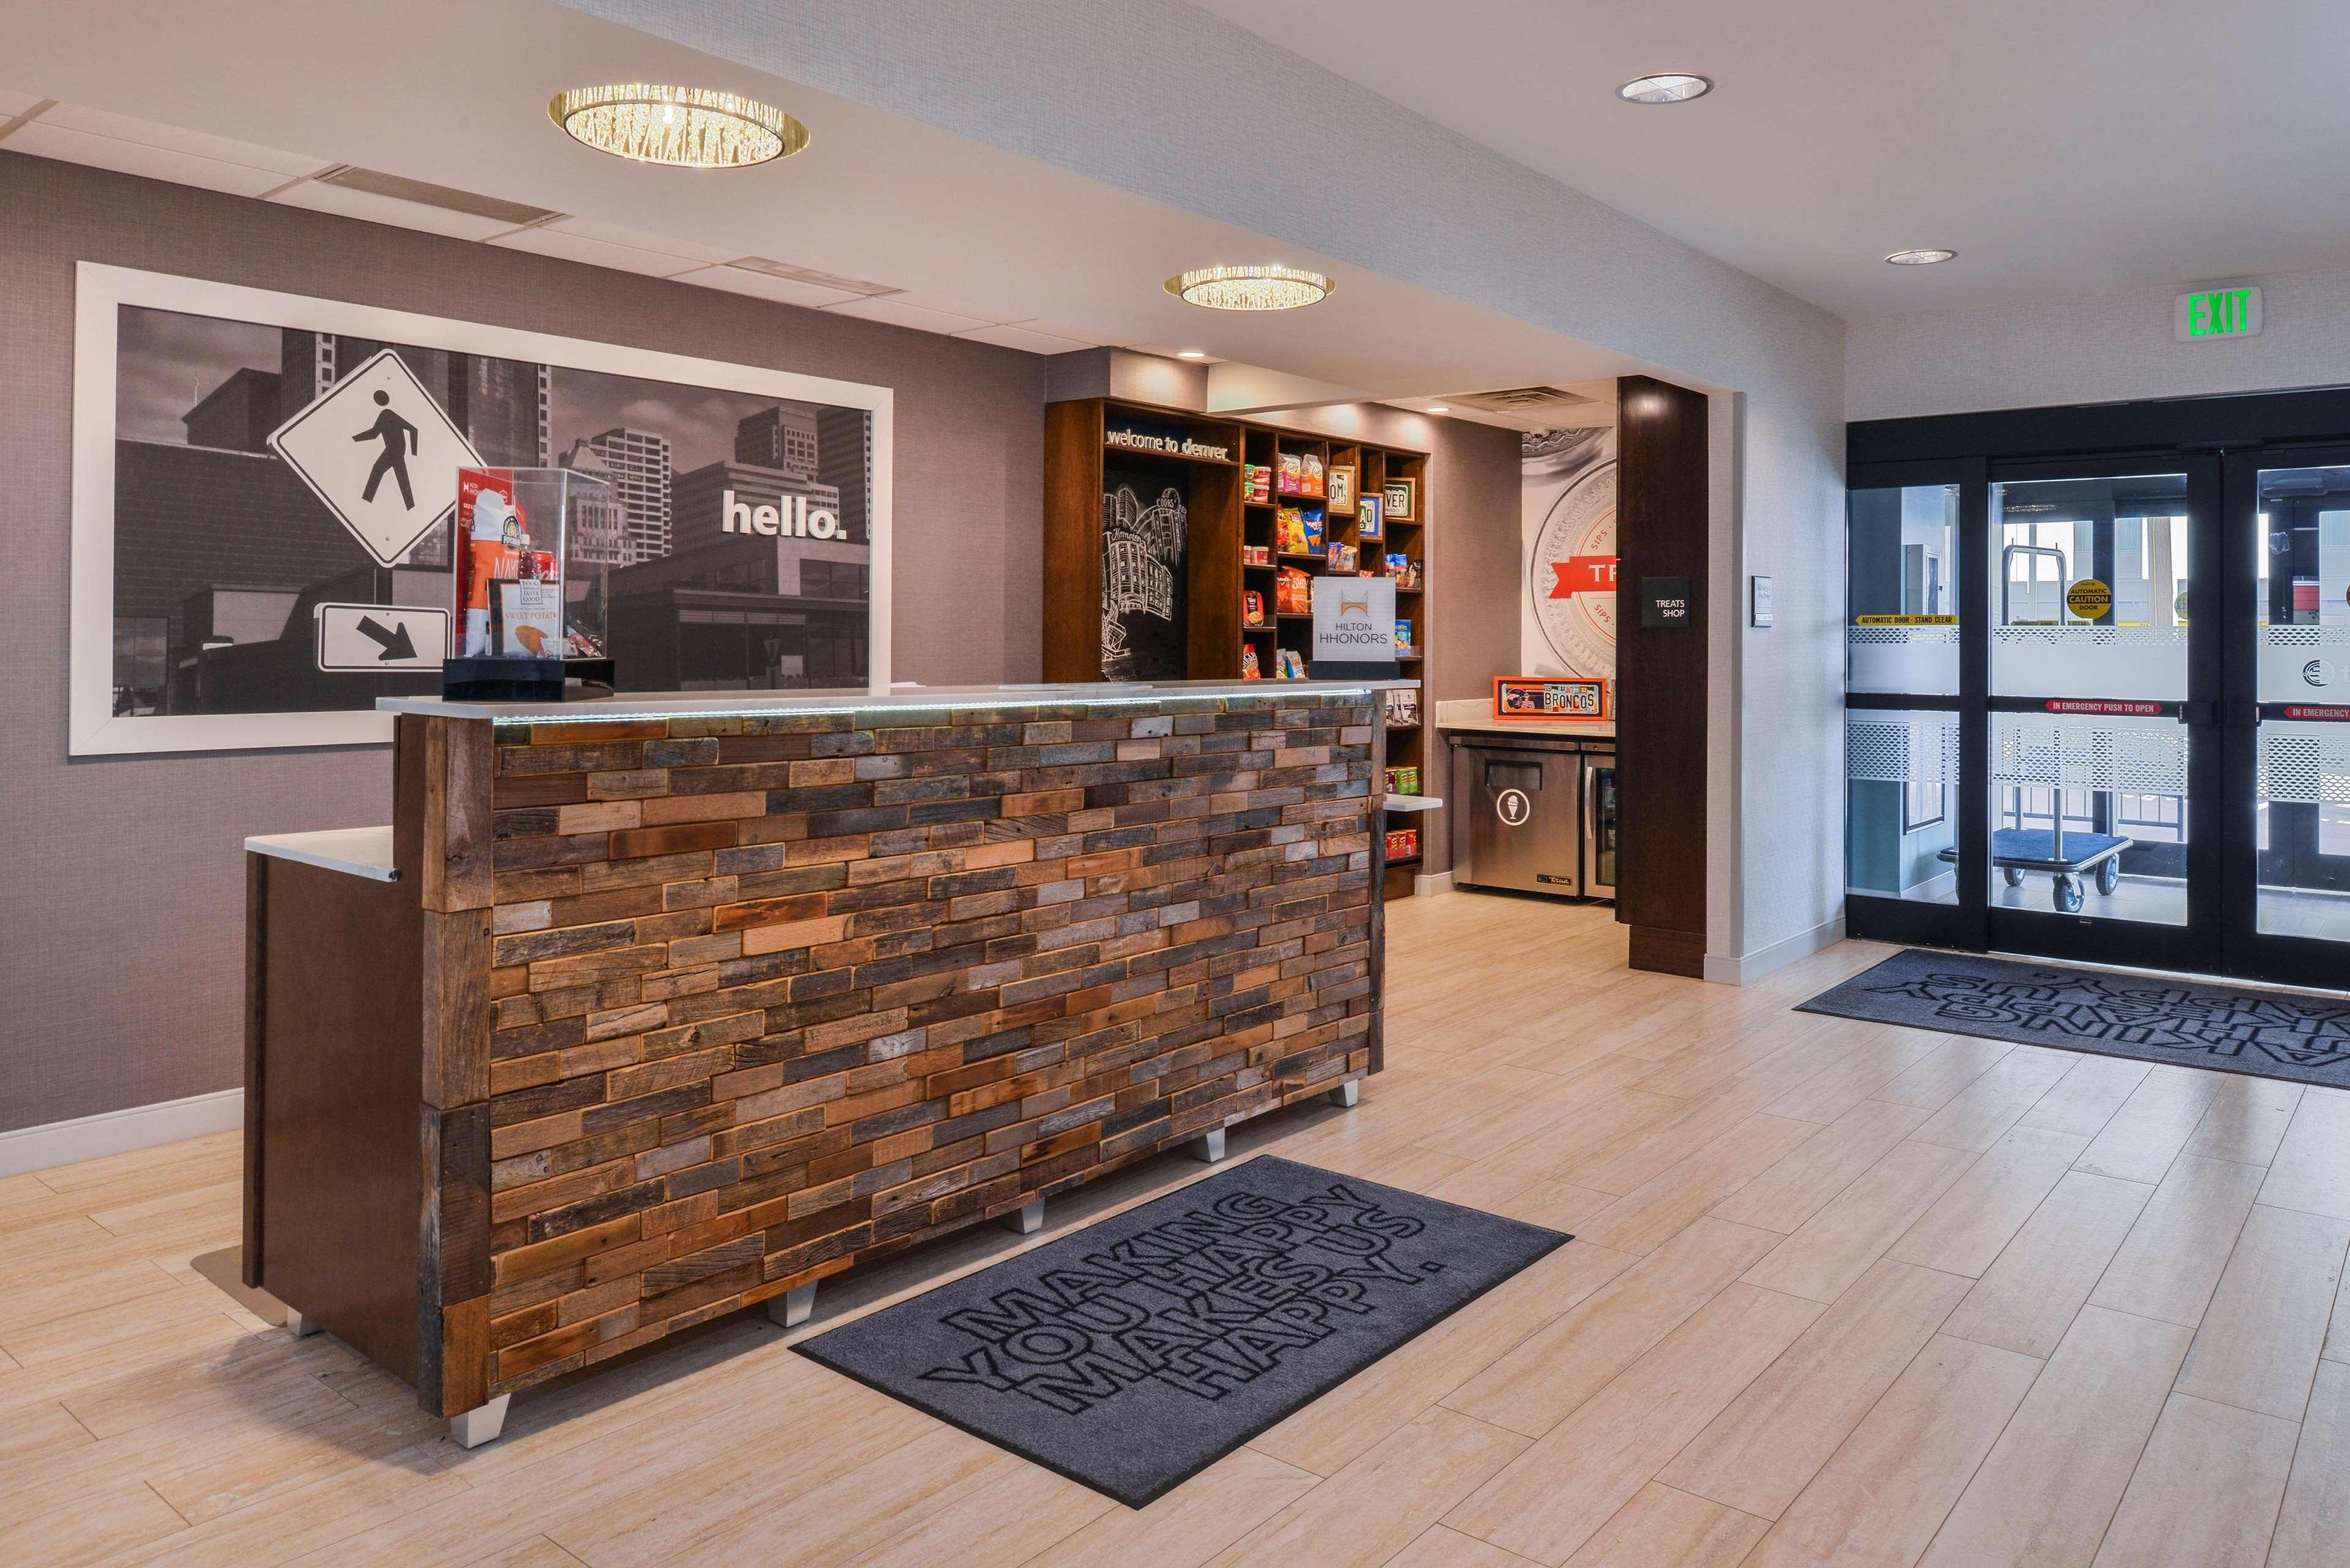 Hampton Inn & Suites Denver-Speer Boulevard image 12